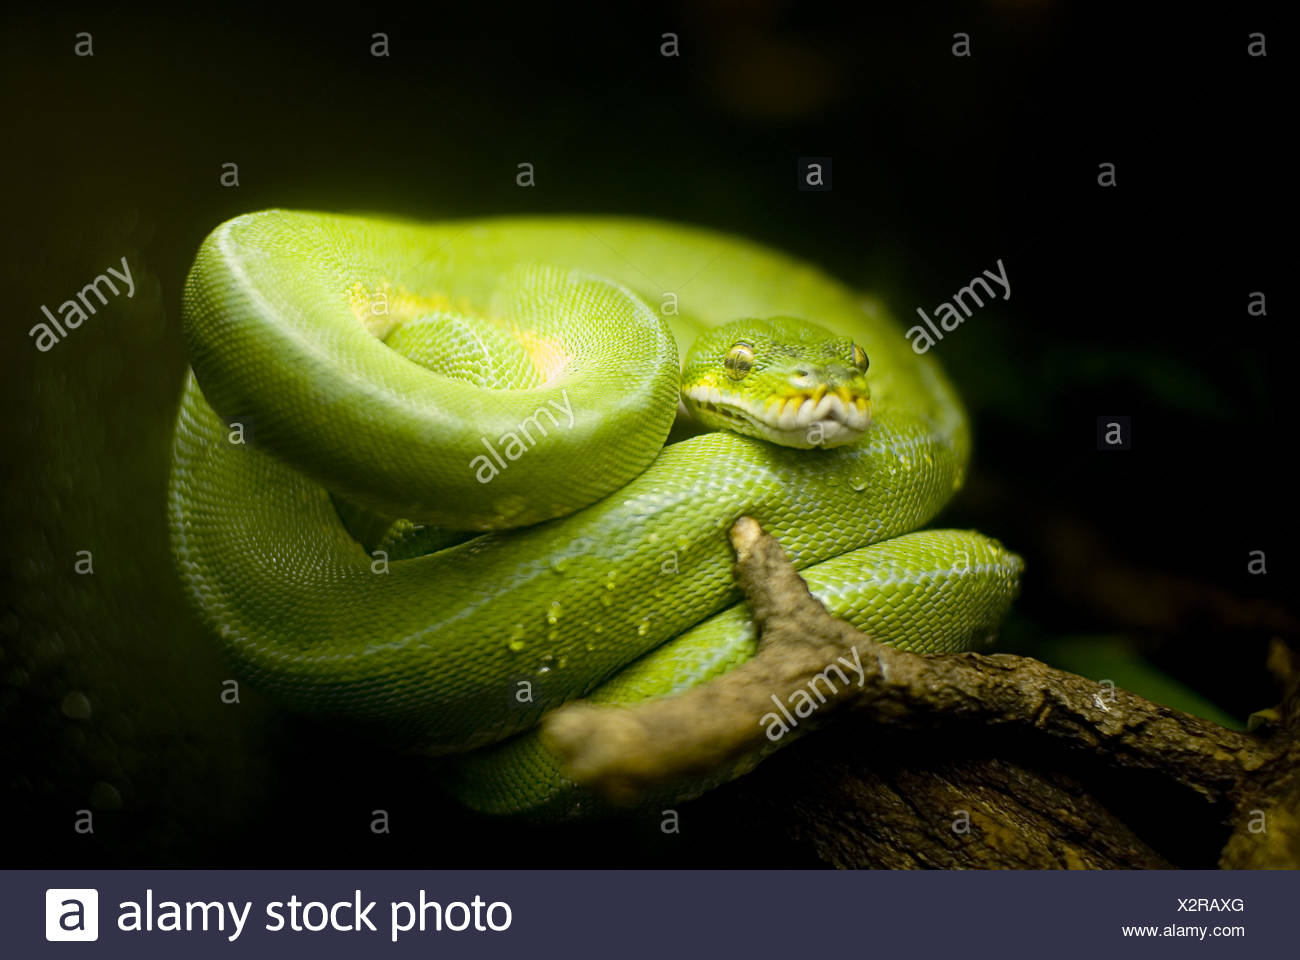 Snake - Stock Image